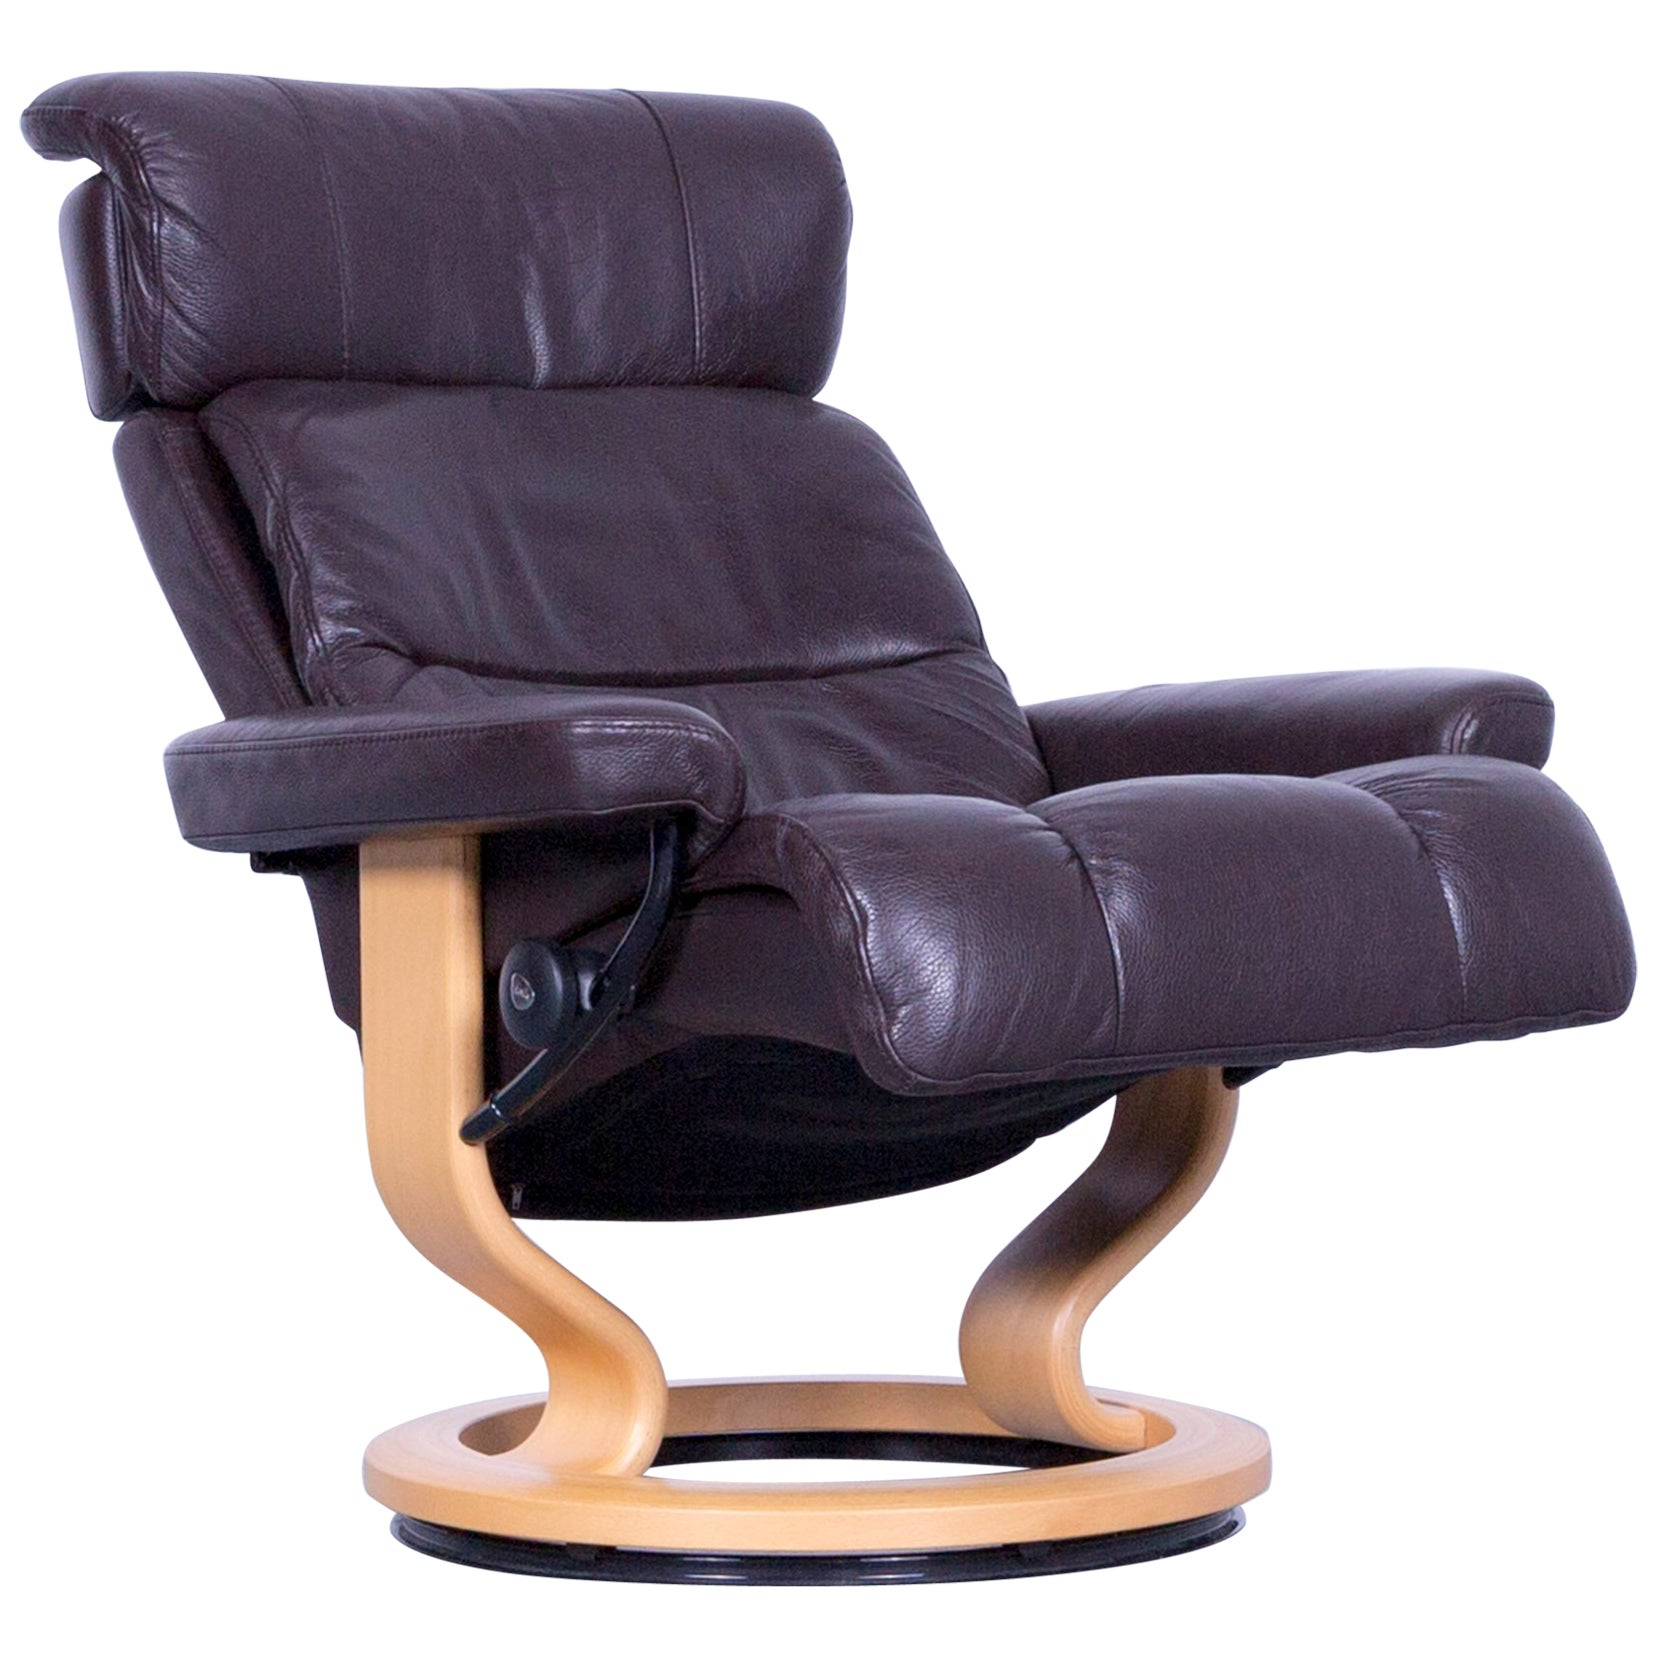 modern recliner chair revolving online shopping in pakistan ekornes stressless memphis armchair brown leather designer for sale at 1stdibs